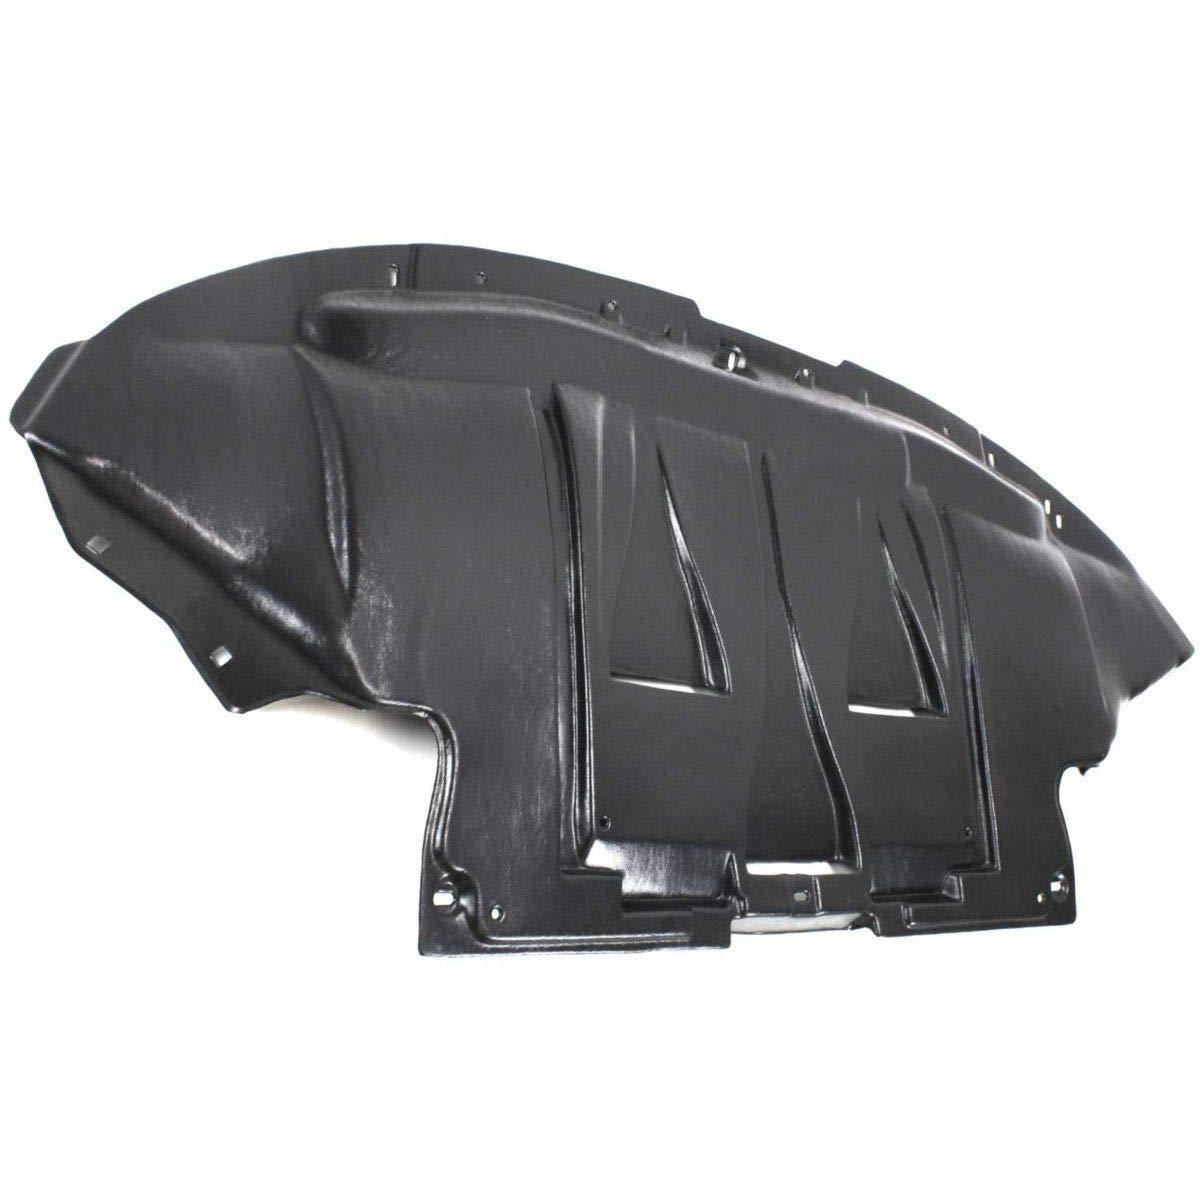 New Front Engine Splash Shield For 1998-2005 Volkswagen Passat Under Cover VW1228102